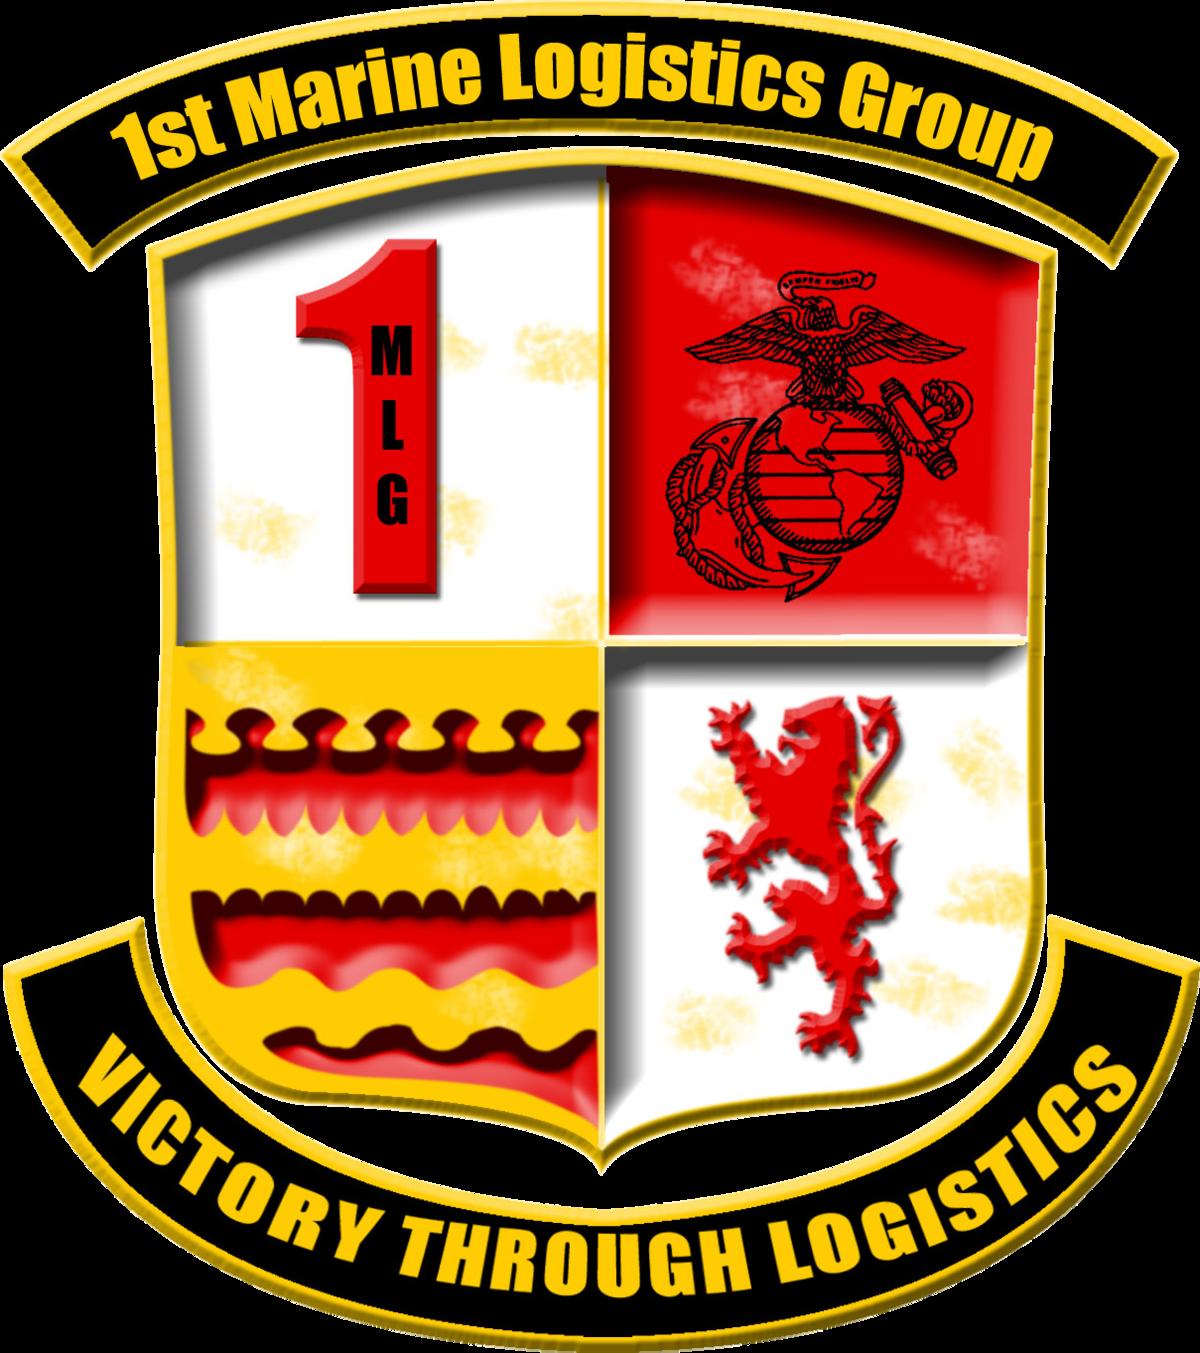 st marine logistics group